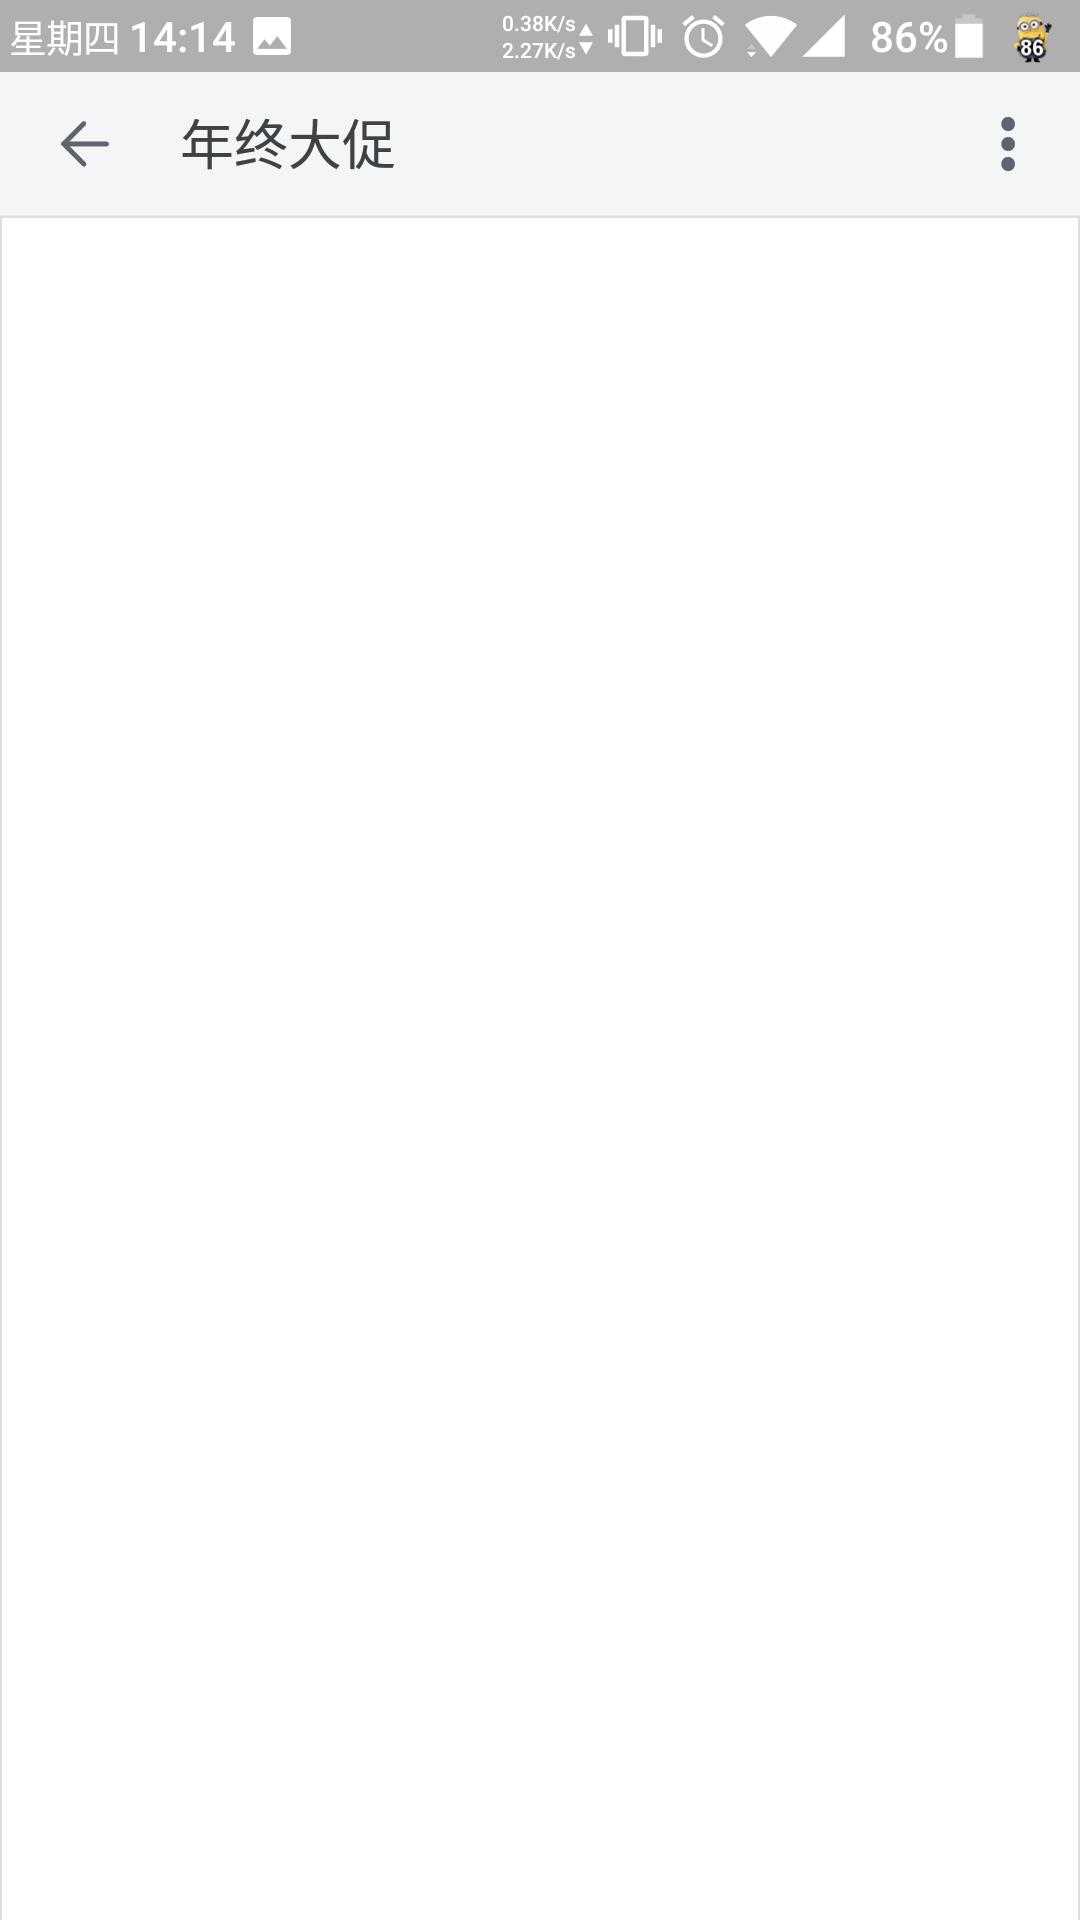 Screenshot_20170105-141402.png